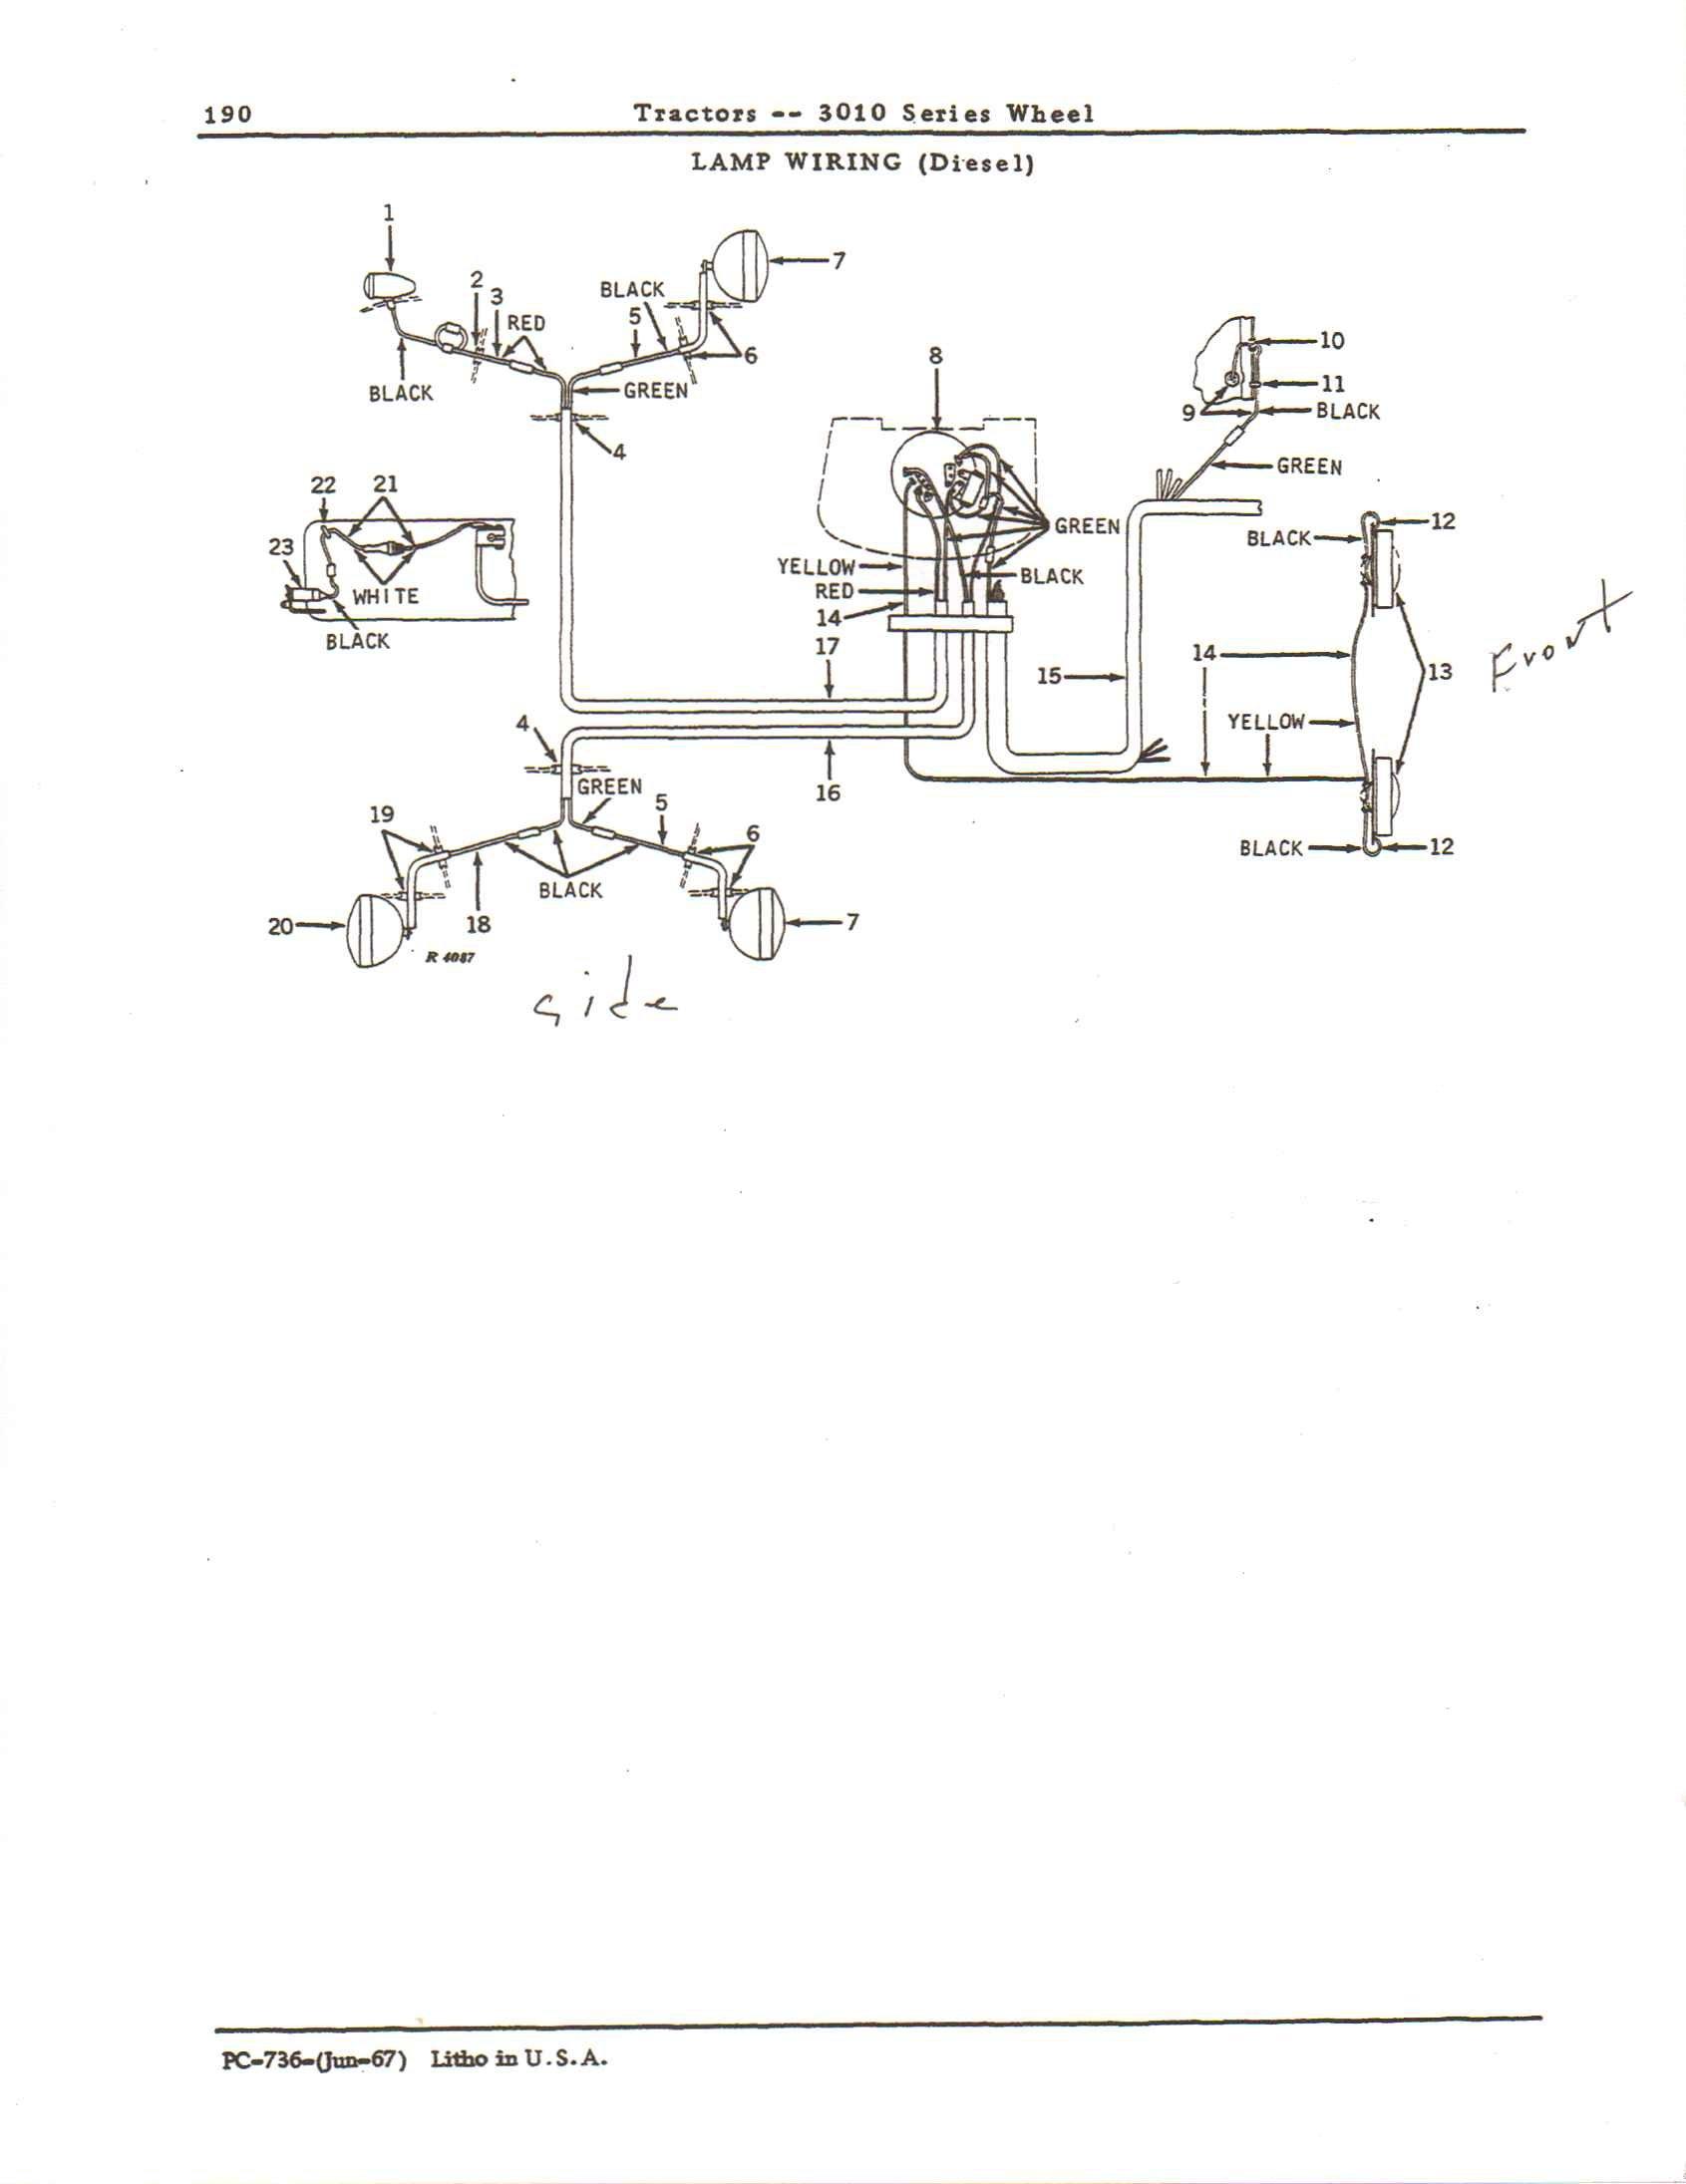 Diagram John Deere Z520a Starter Wiring Diagram Full Version Hd Quality Wiring Diagram Carmotorwiring Creasitionline It